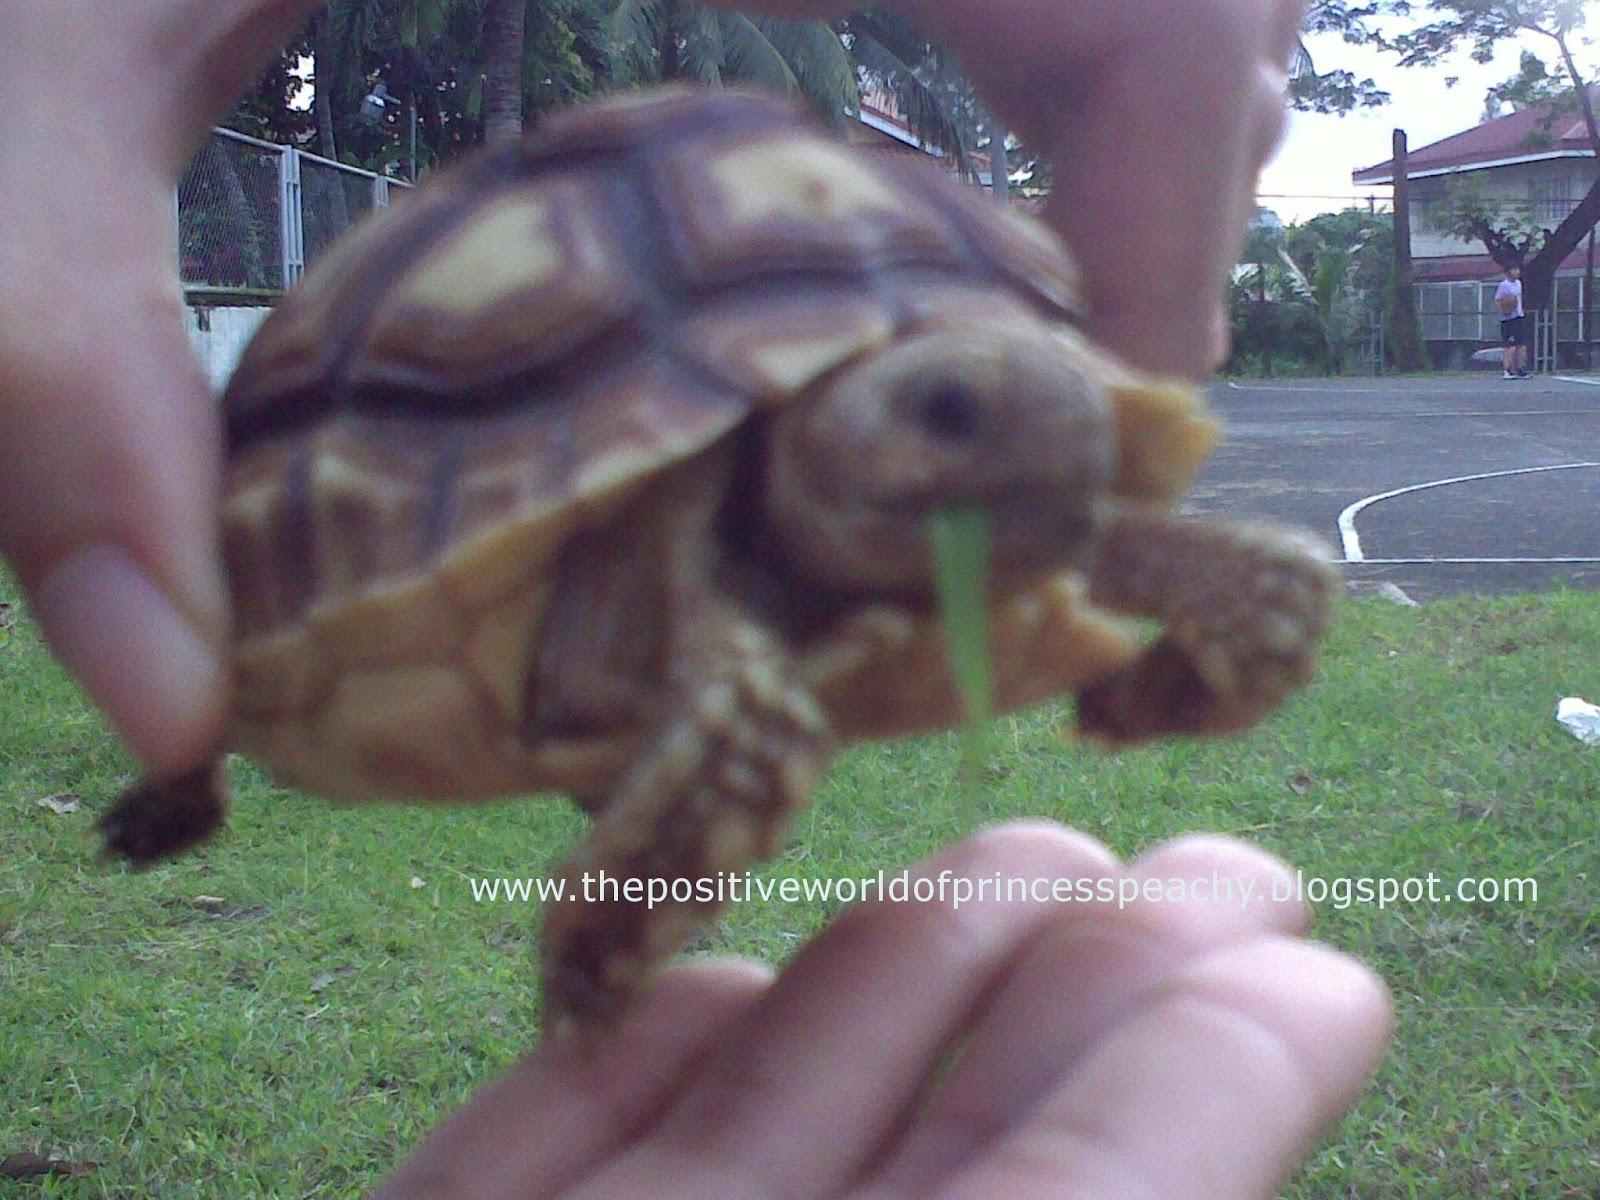 The Positive World Of Princess Peachy, The Happy Sulcata Tortoise: I